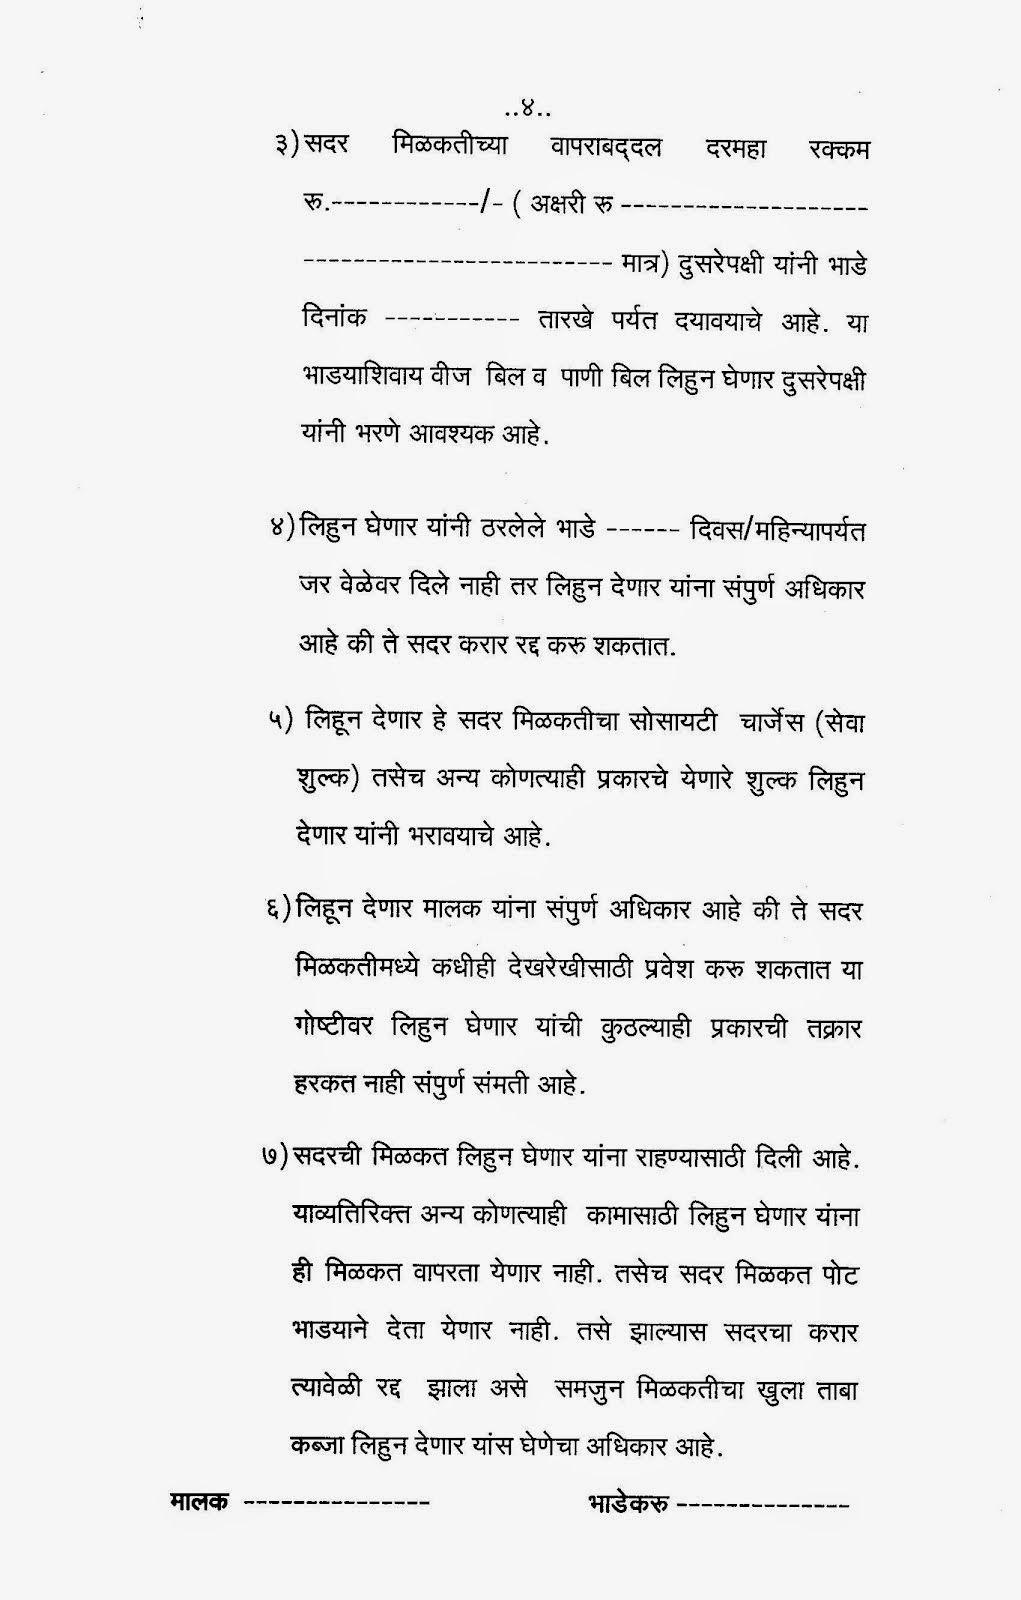 007 Wondrou Room Rent Agreement Format In Hindi Pdf Photo Full